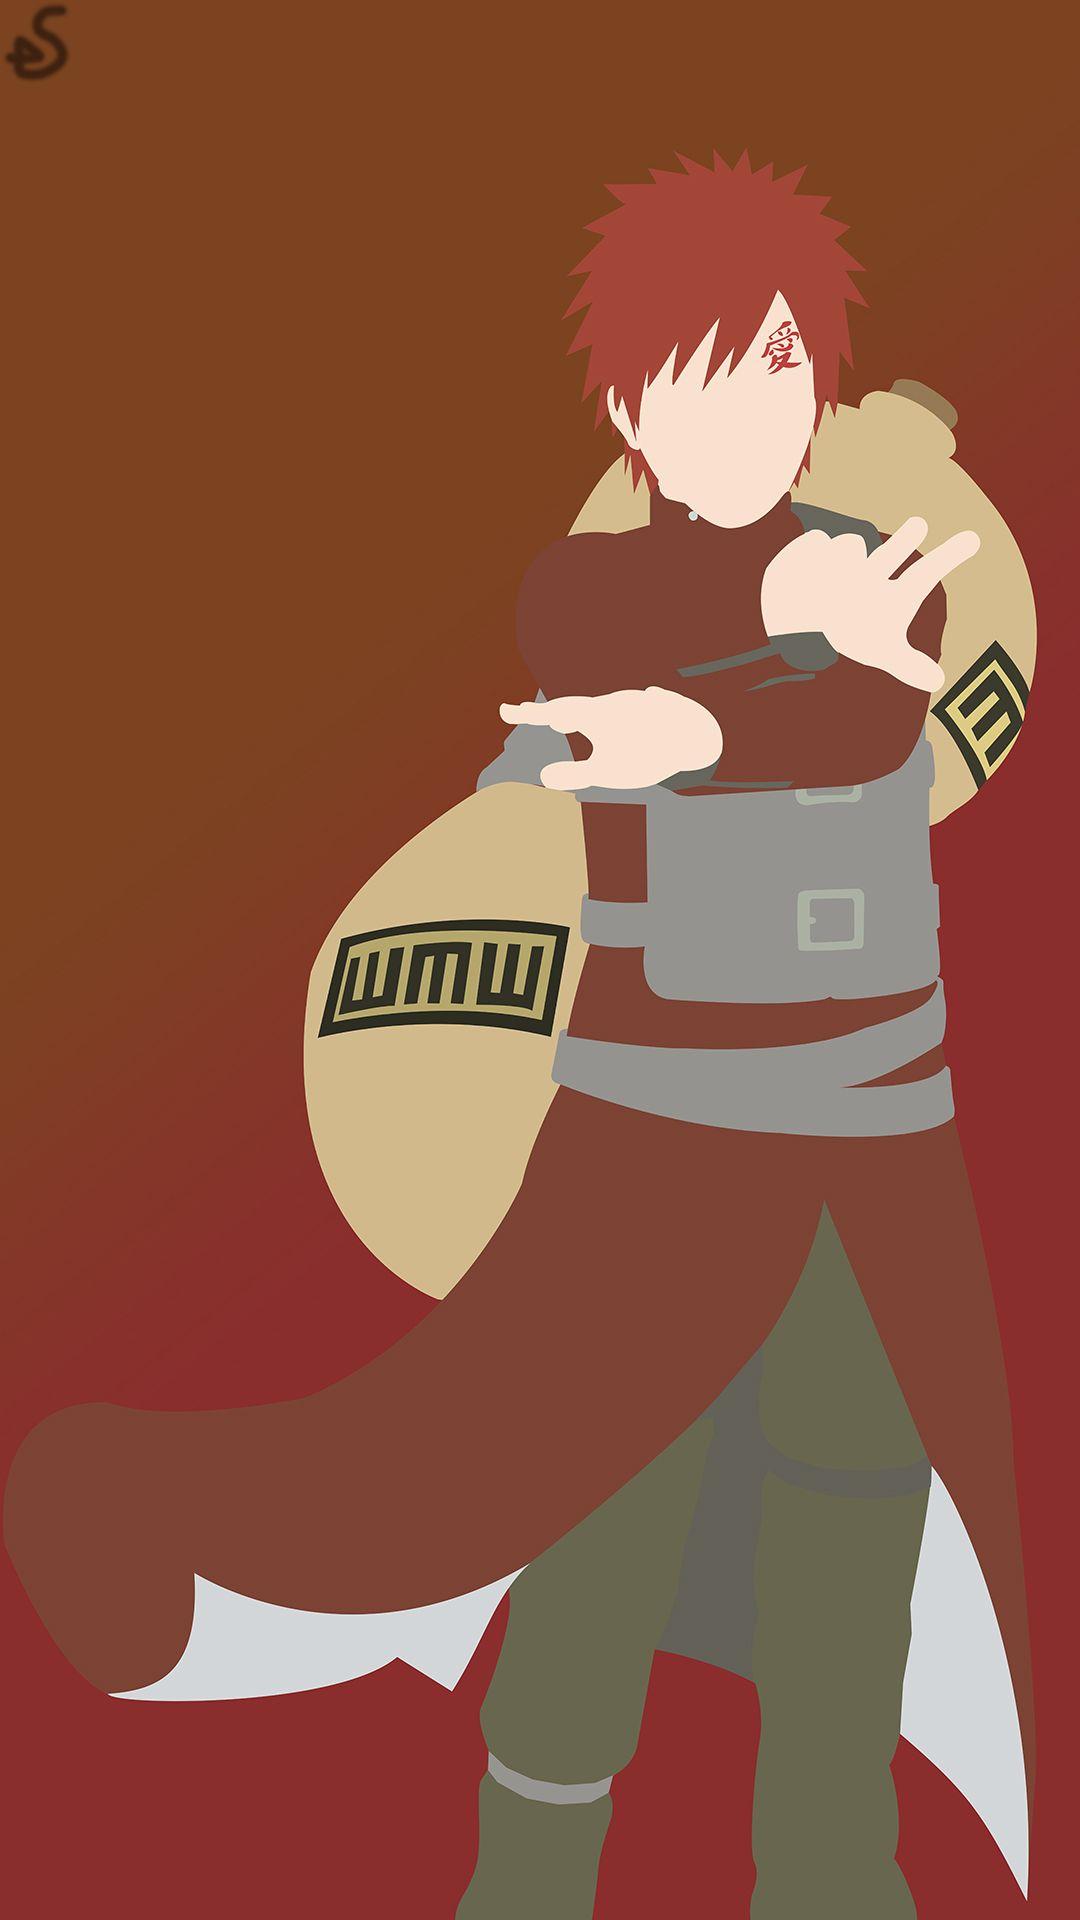 Gaara Of The Desert Naruto Phone Wallpaper By ShogunArts98 On DeviantArt